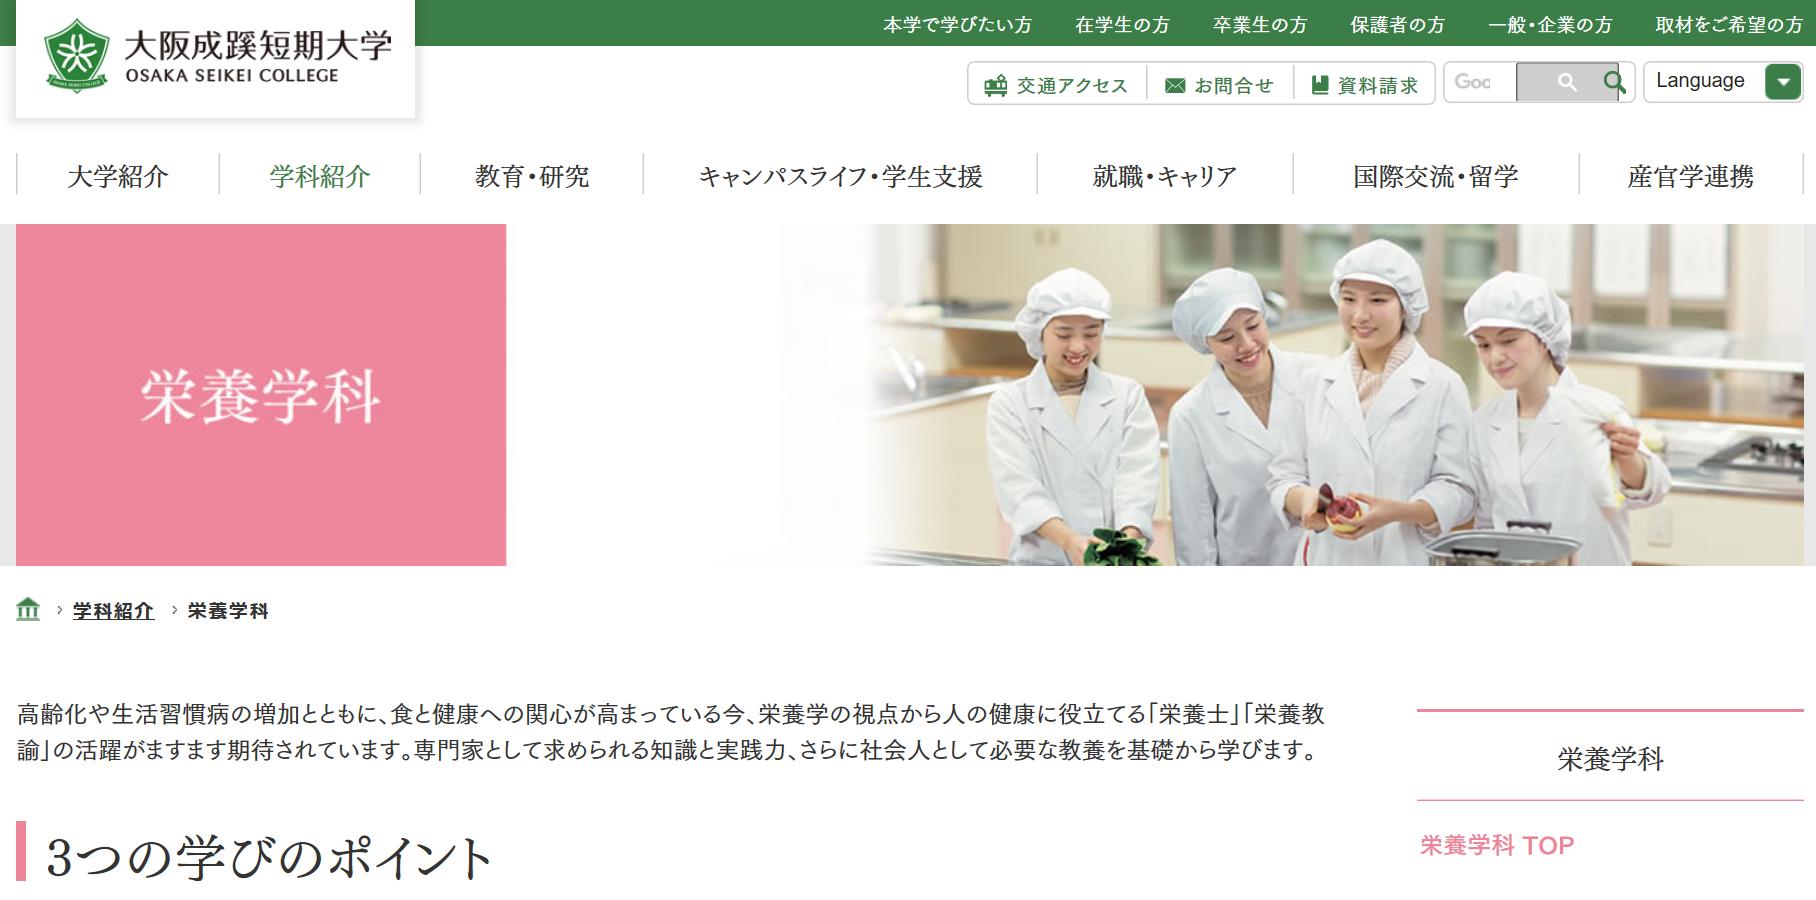 入試情報サイト S-NET|成蹊大学